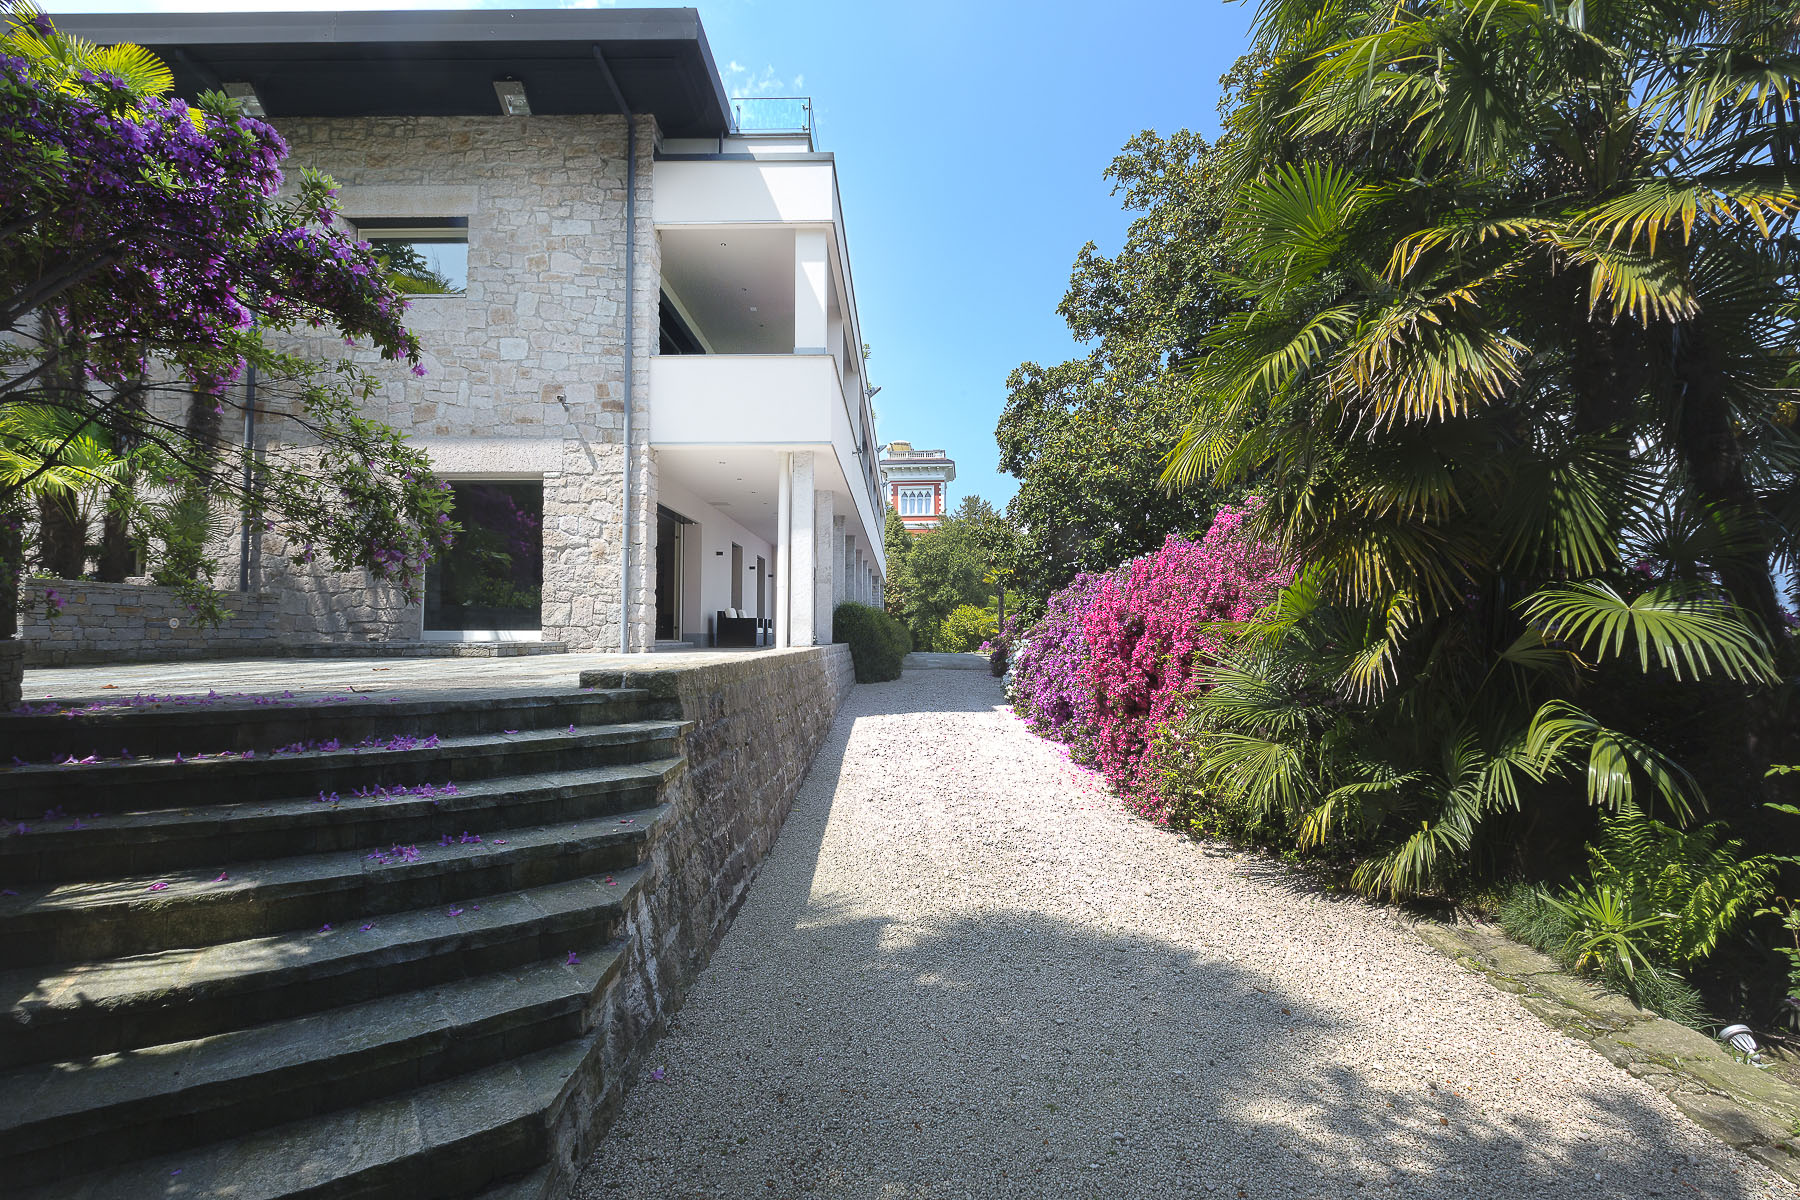 Villa in Vendita a Stresa: 5 locali, 1440 mq - Foto 7